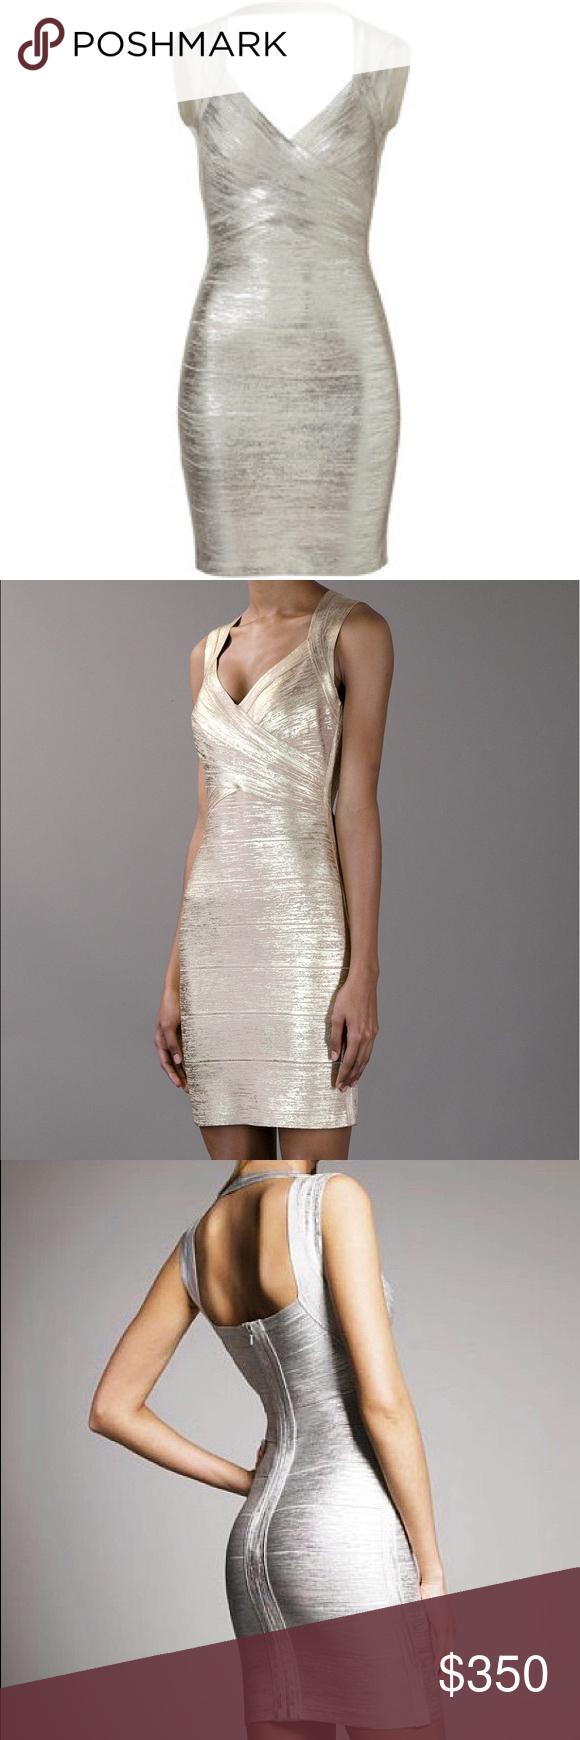 Herve leger white metallic dress the hervé léger silver tone